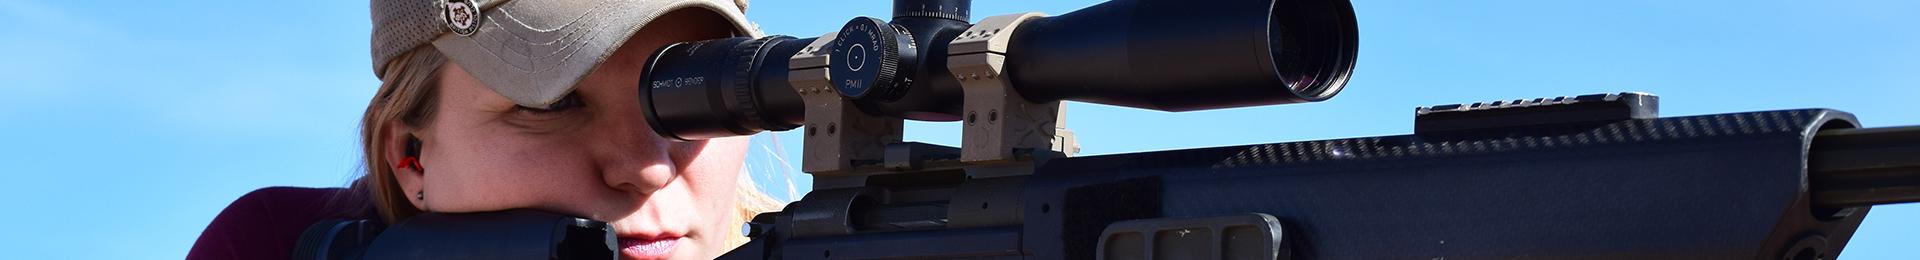 Riflecraft Header - Adam's Wife on Tripod